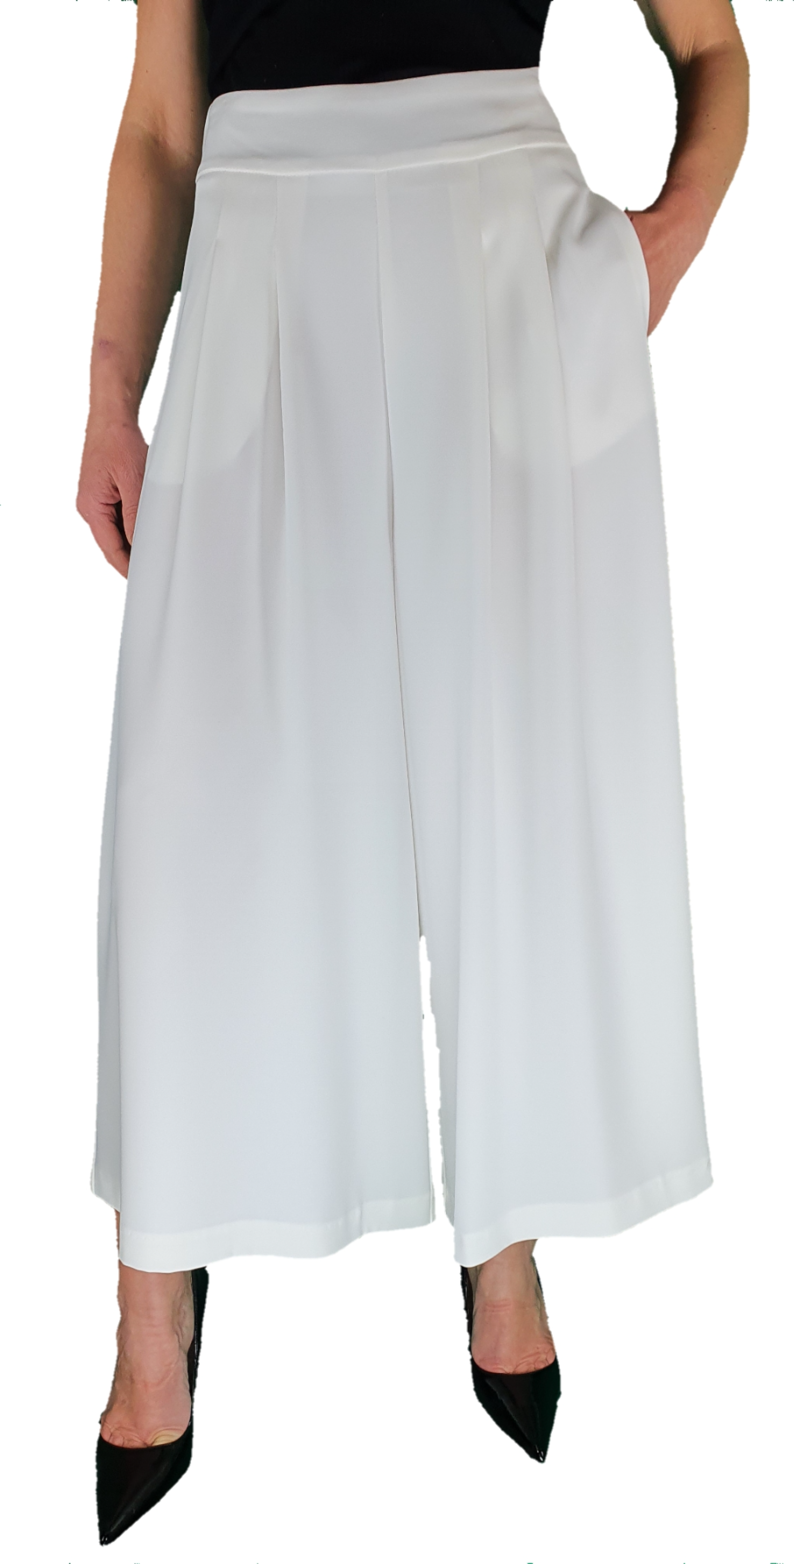 gonna-pantalone-bianca-art-655